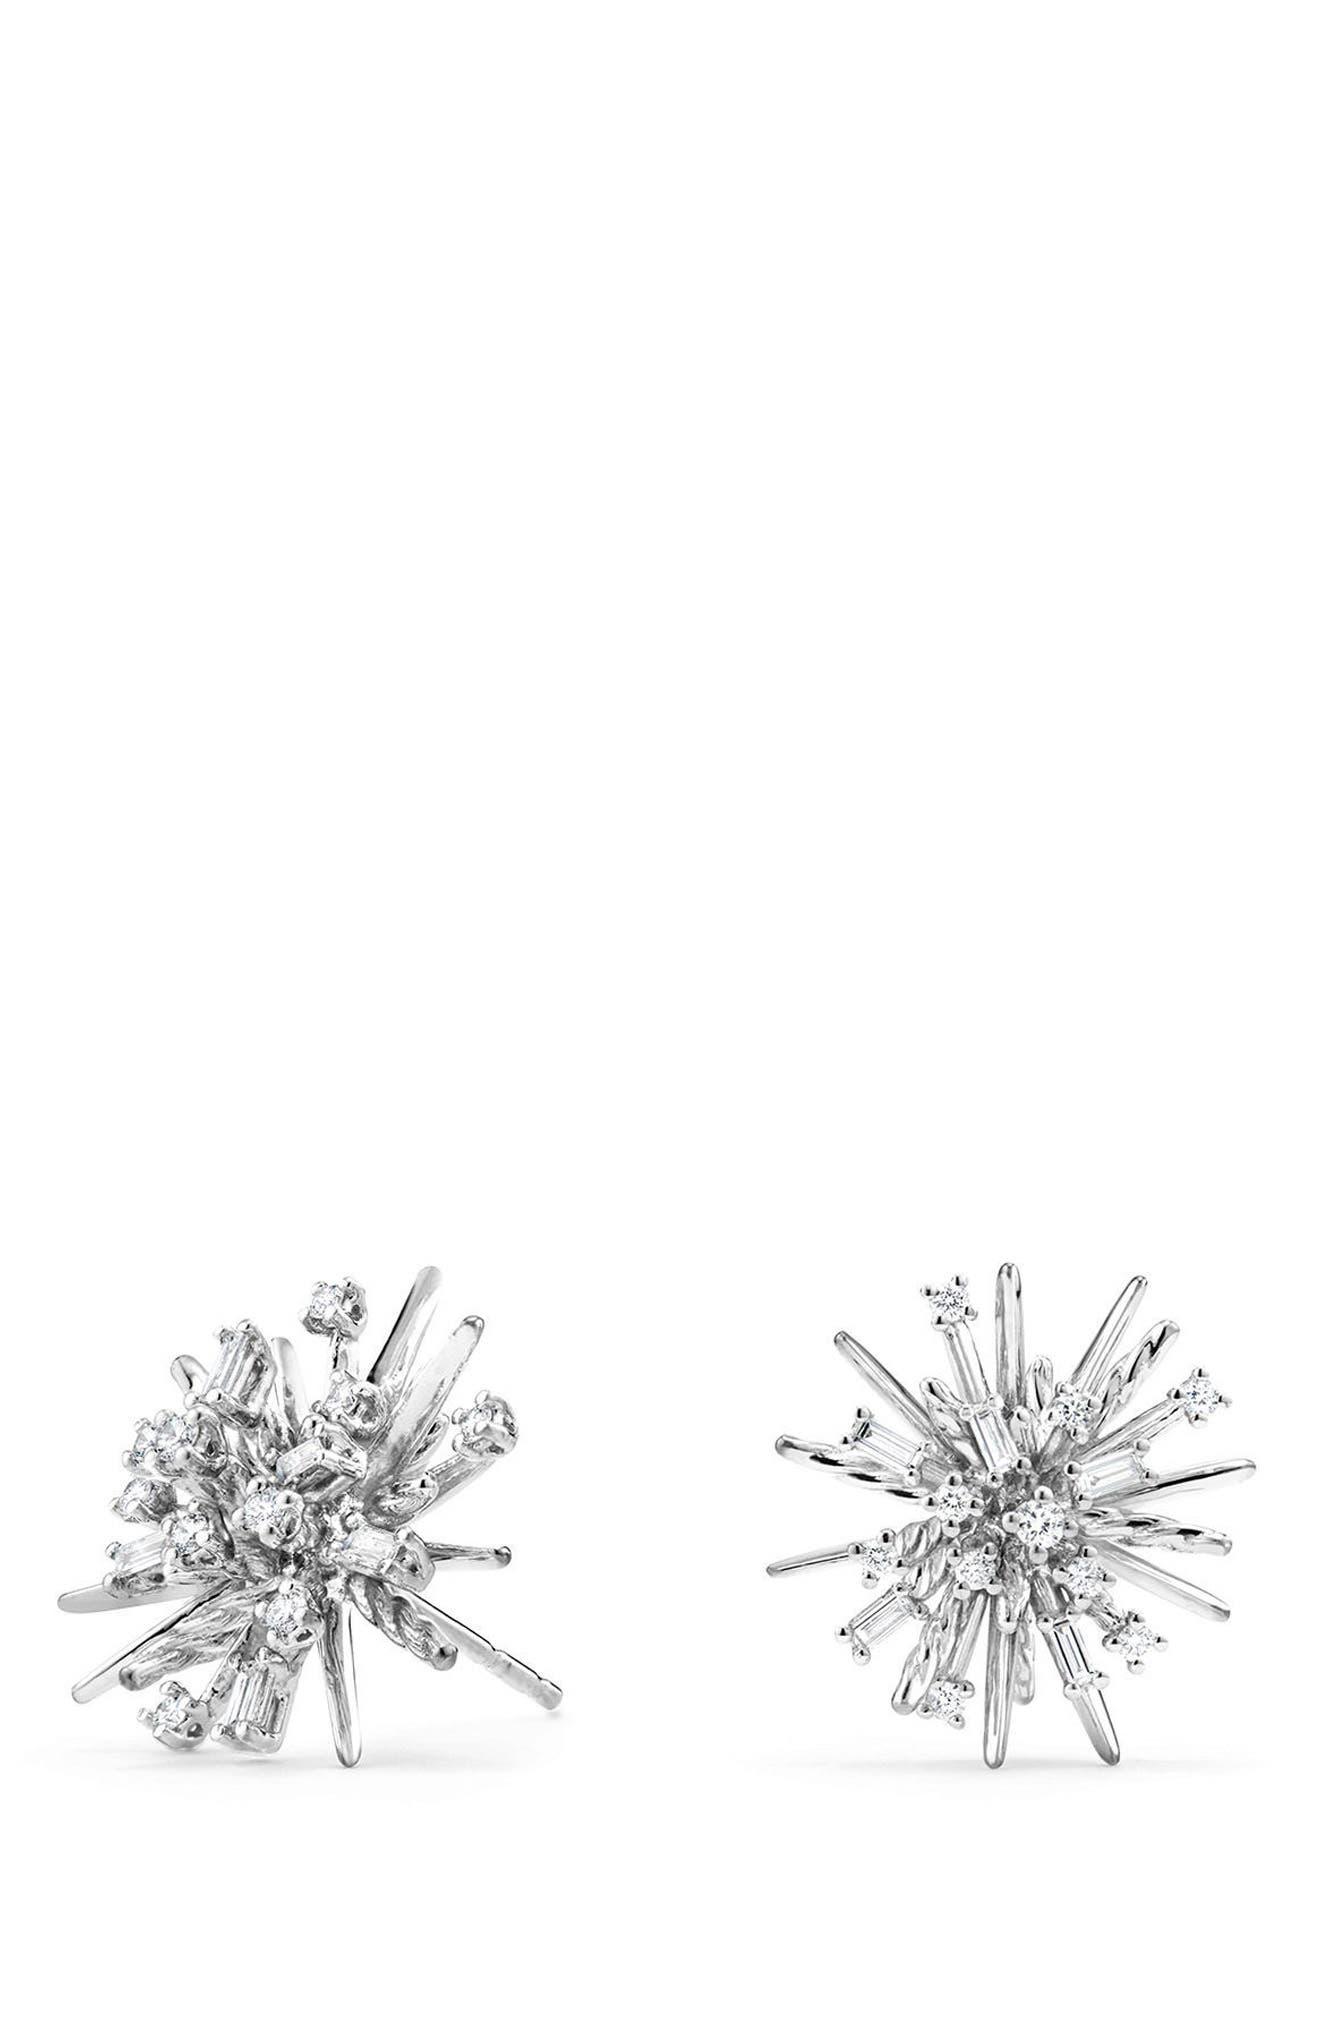 Supernova Stud Earrings with Diamonds in 18K White Gold,                             Main thumbnail 1, color,                             White Gold/ Diamond